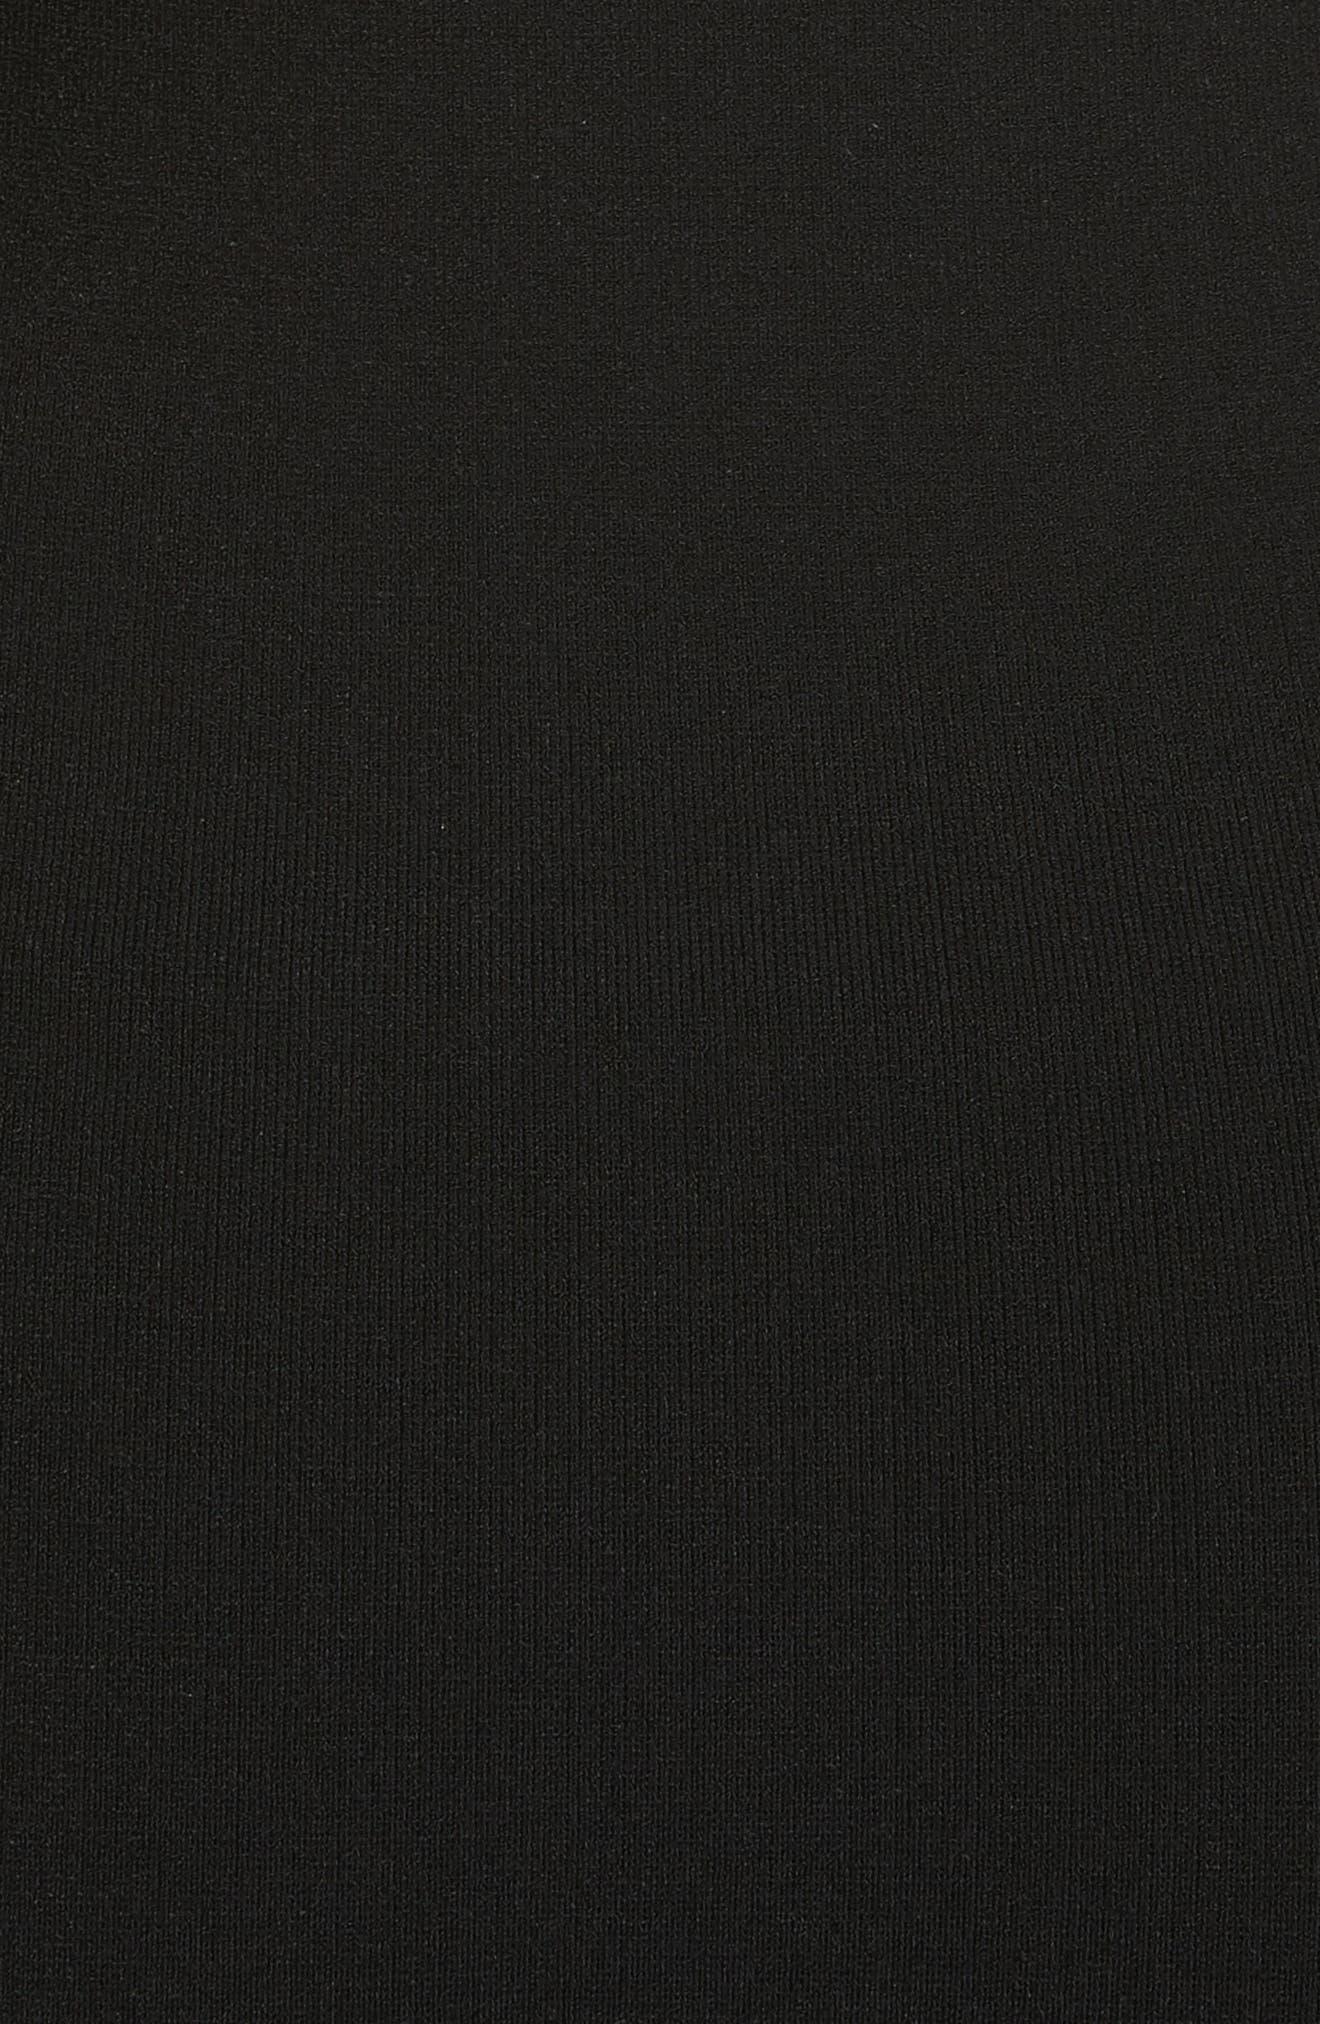 Cold Shoulder Flounce Sheath Dress,                             Alternate thumbnail 5, color,                             Black